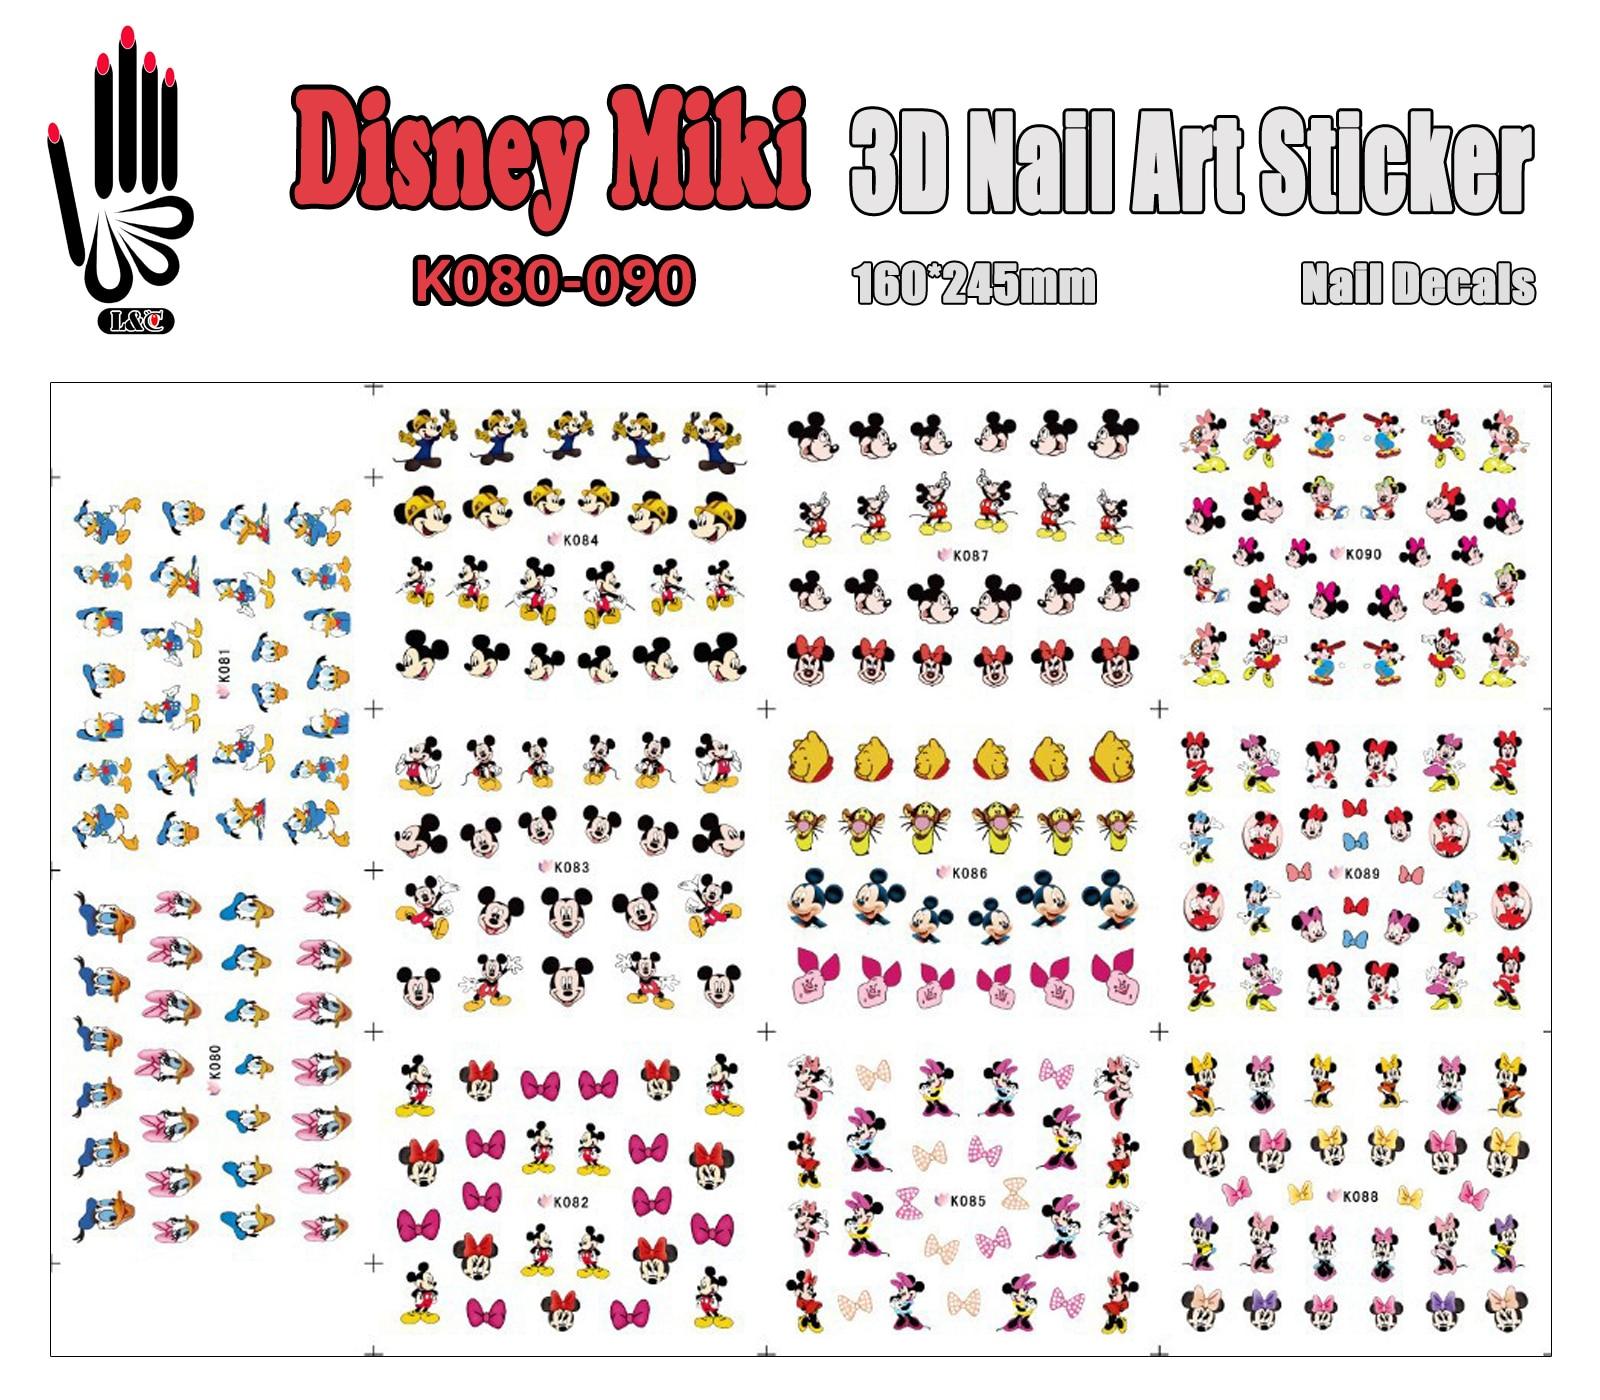 3D Beauty Nail Sticker K080-090 Cartoon Mickey Bear Duck Mouse 3D Nail Art Sticker Decal For Nail Large Piece(11 DESIGNS IN 1) nail art large piece yb529 540 12 designs in 1 cartoon pet hello kitty nail art water transfer sticker decal for nail